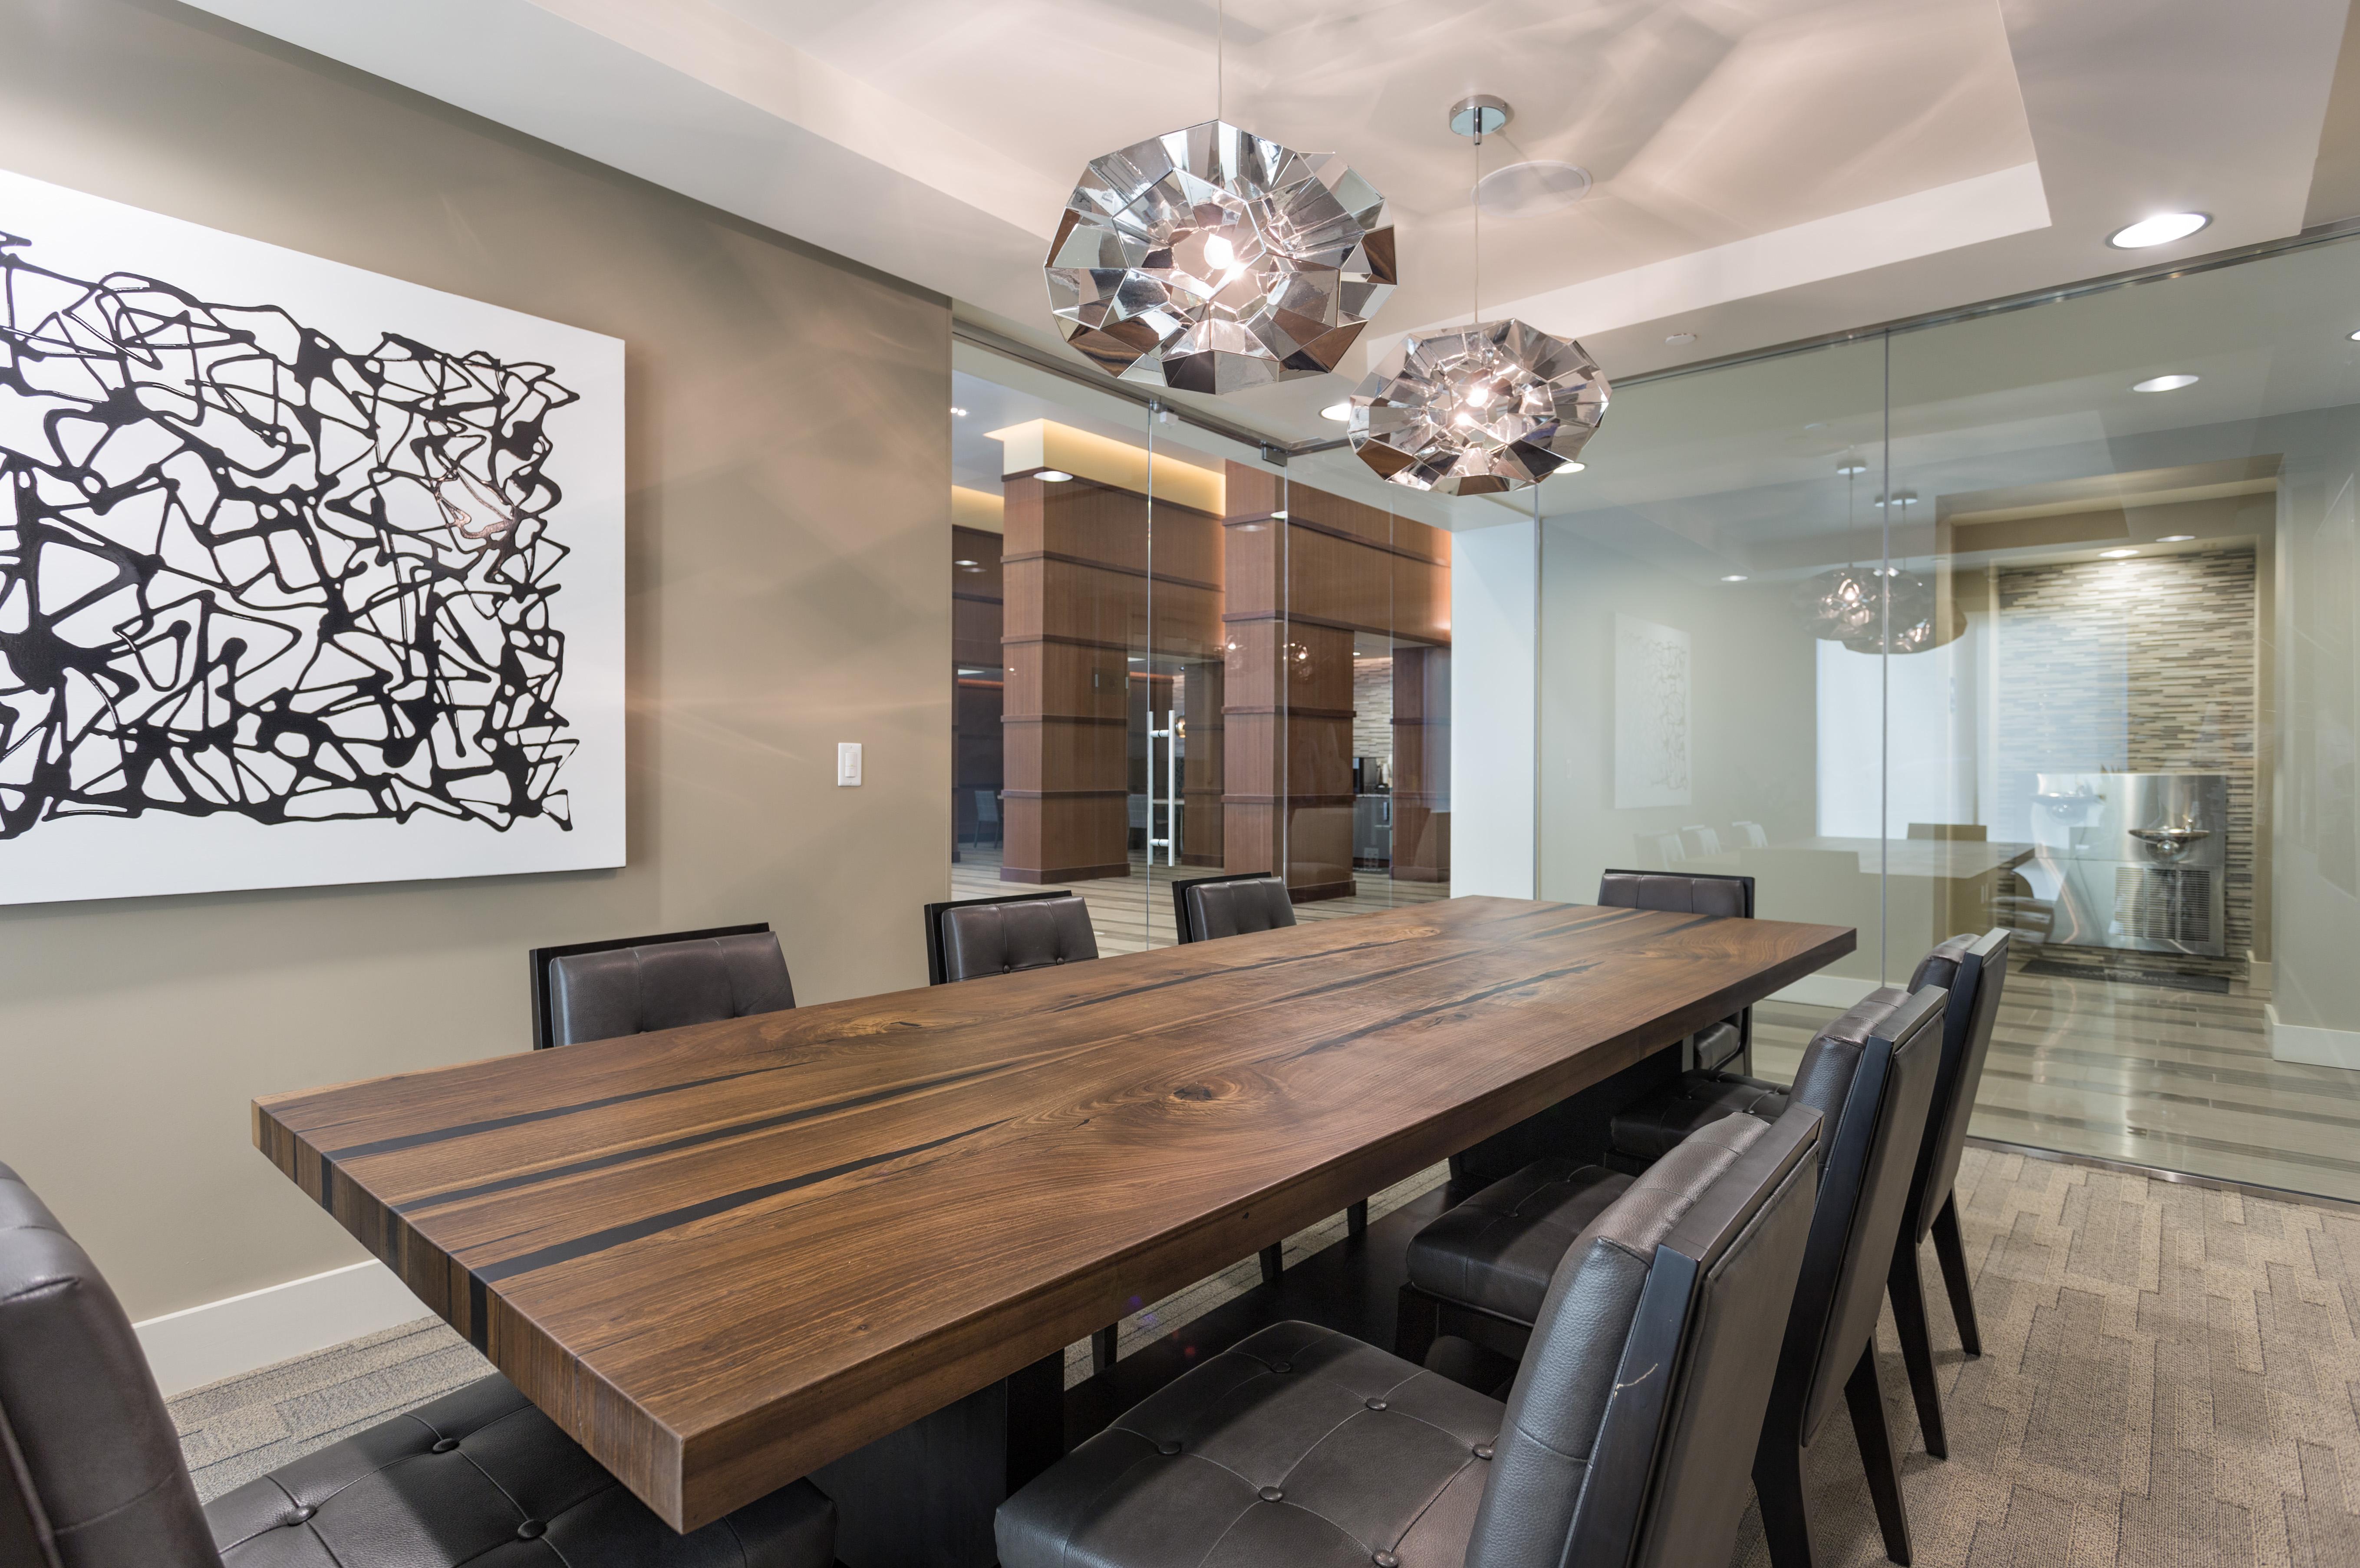 20-camden-rainey-street-apartments-in-austin-tx-executive-conference-room.jpg